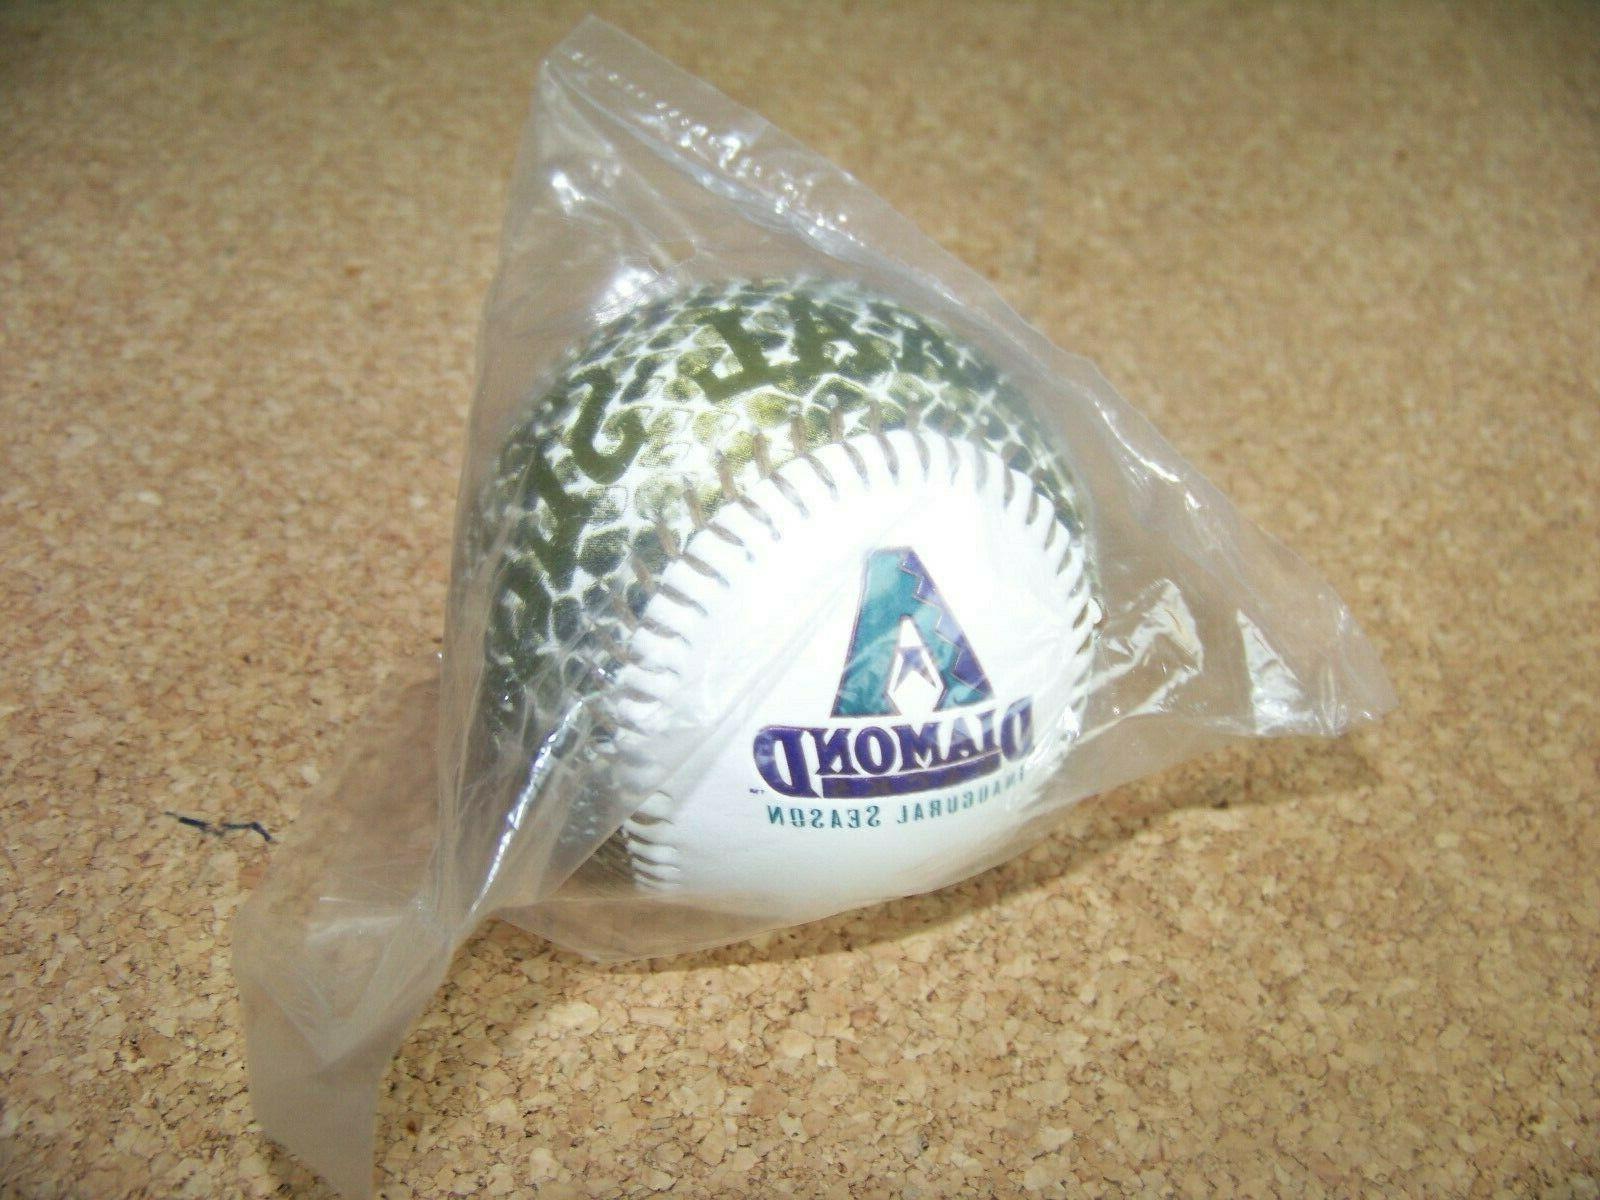 1998 inaugural season arizona diamondbacks baseball ball